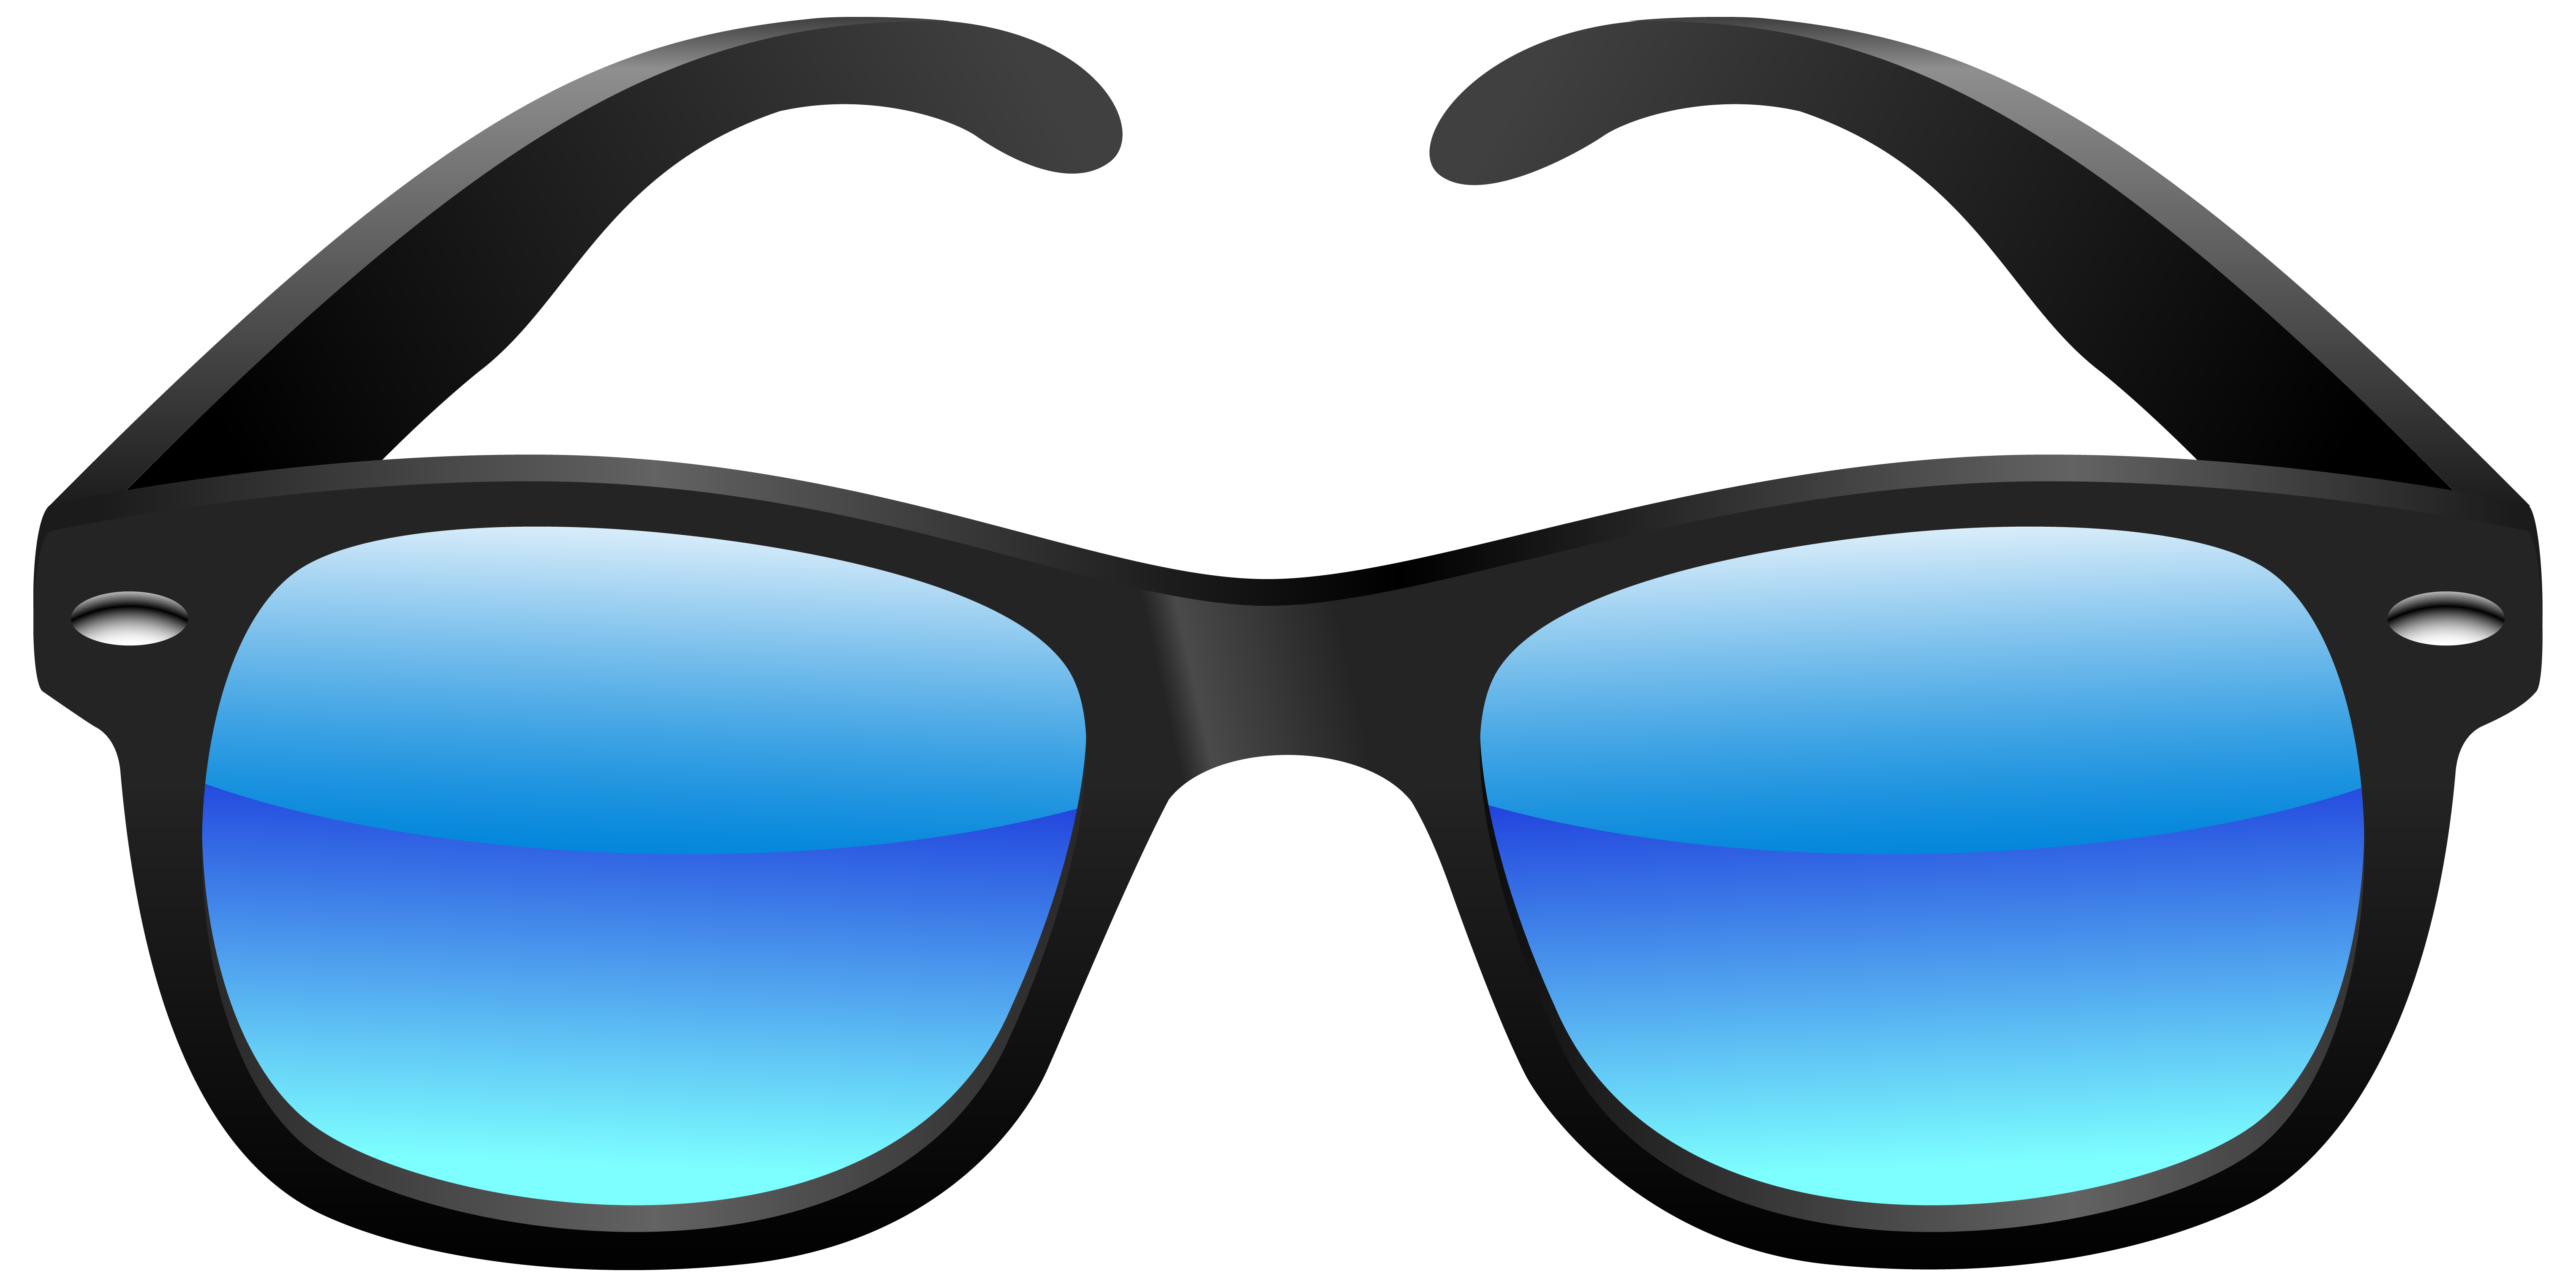 6099x3047 Clip Art Of Sunglasses Clipart Clipartwiz